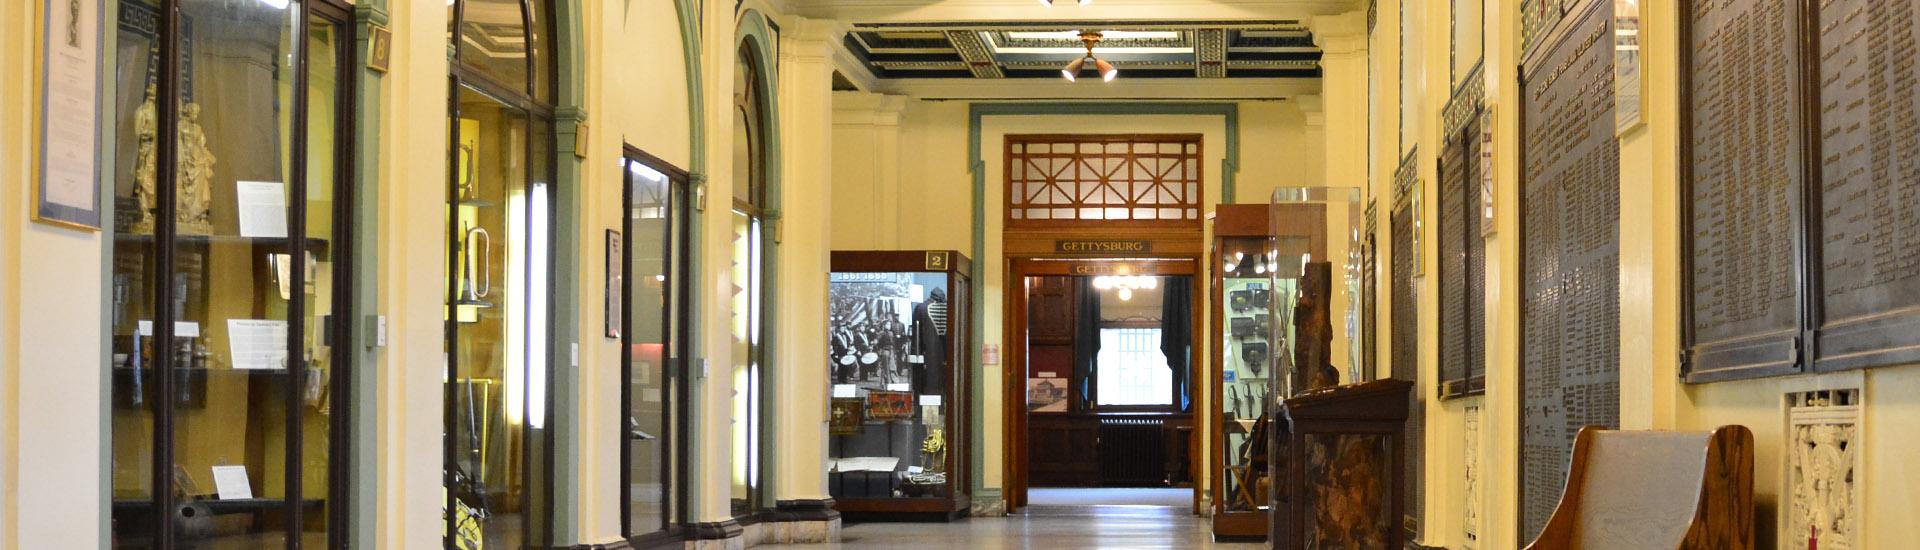 museumheader_hall